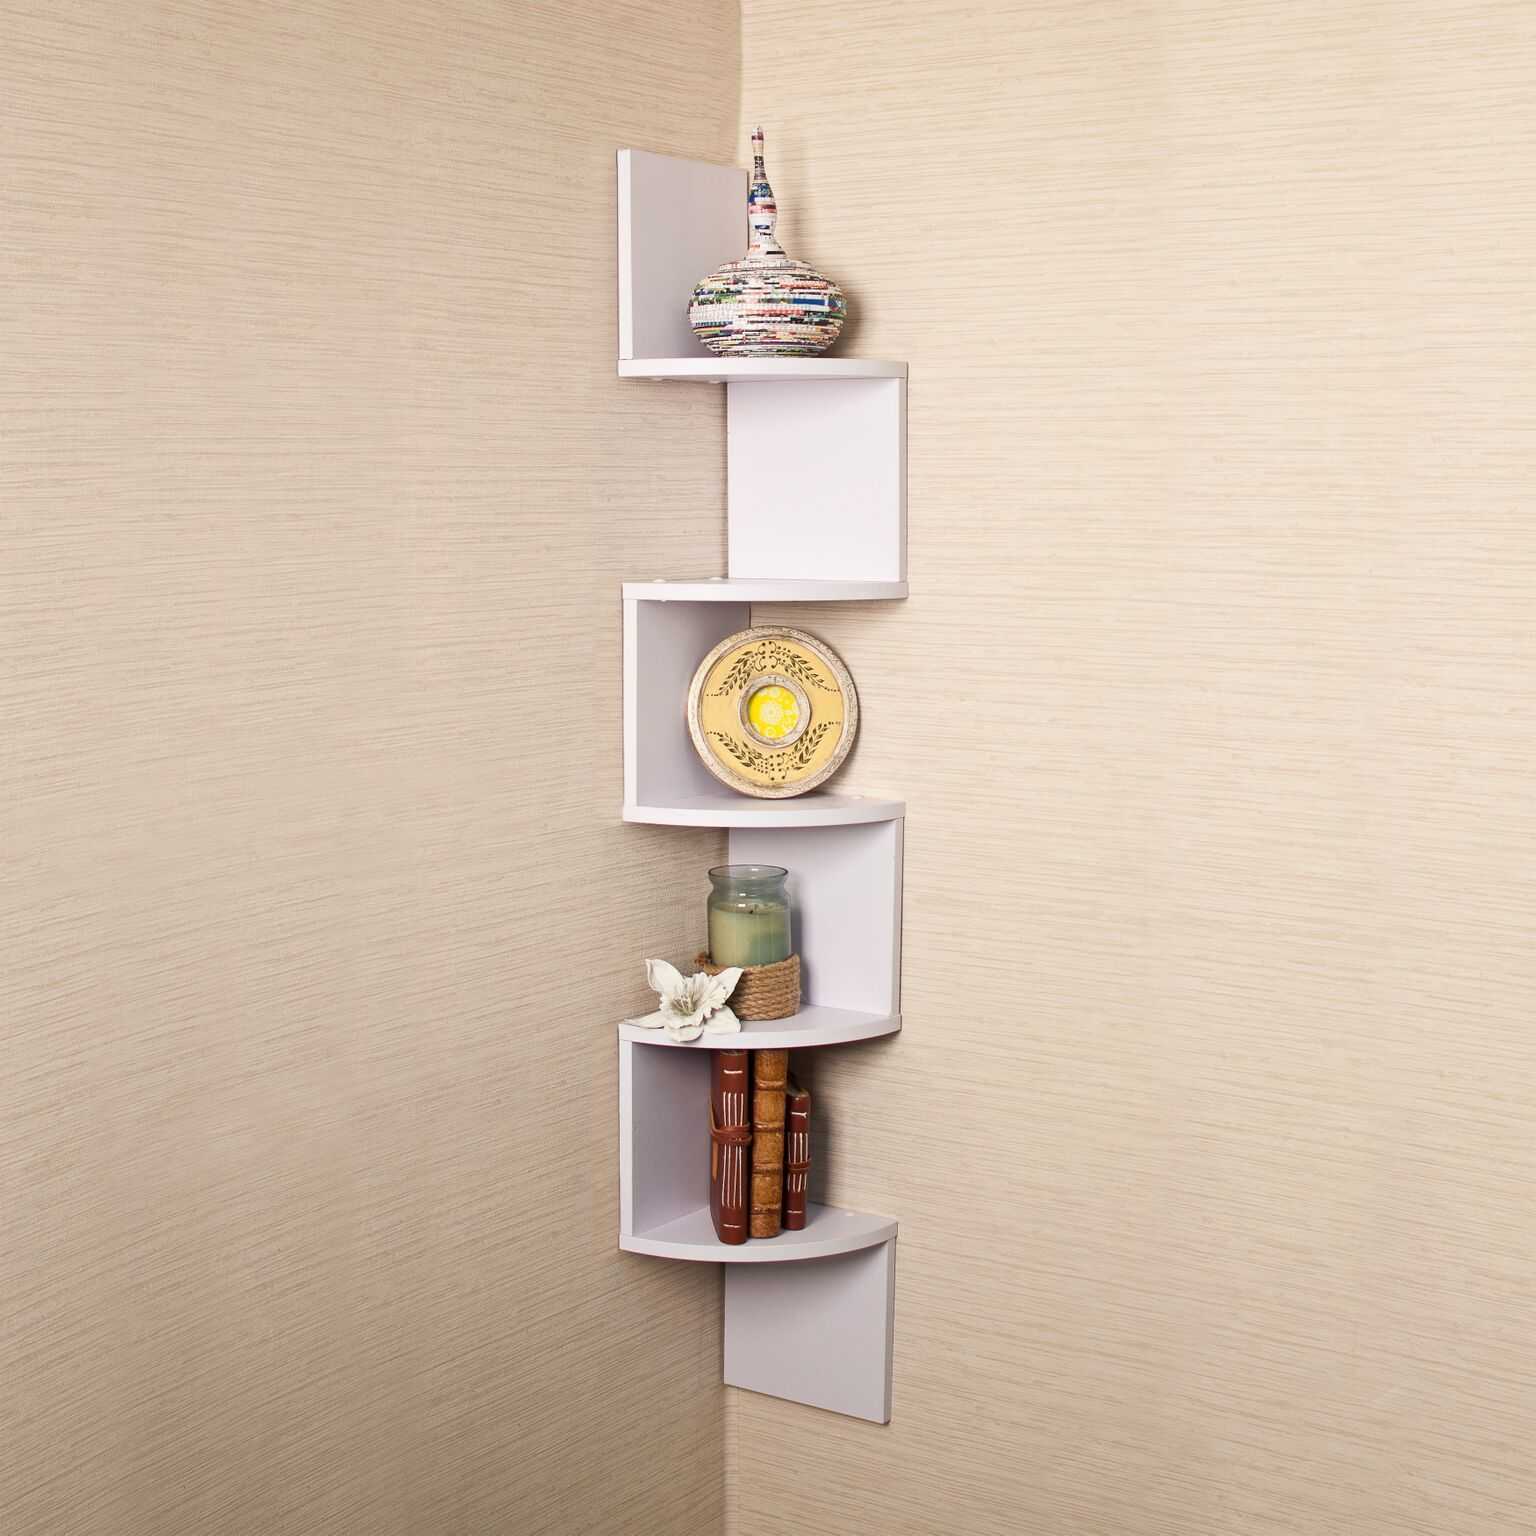 White Floating Wall Shelves Corner Shelf Storage Display Bookcase 2 5 Tier High